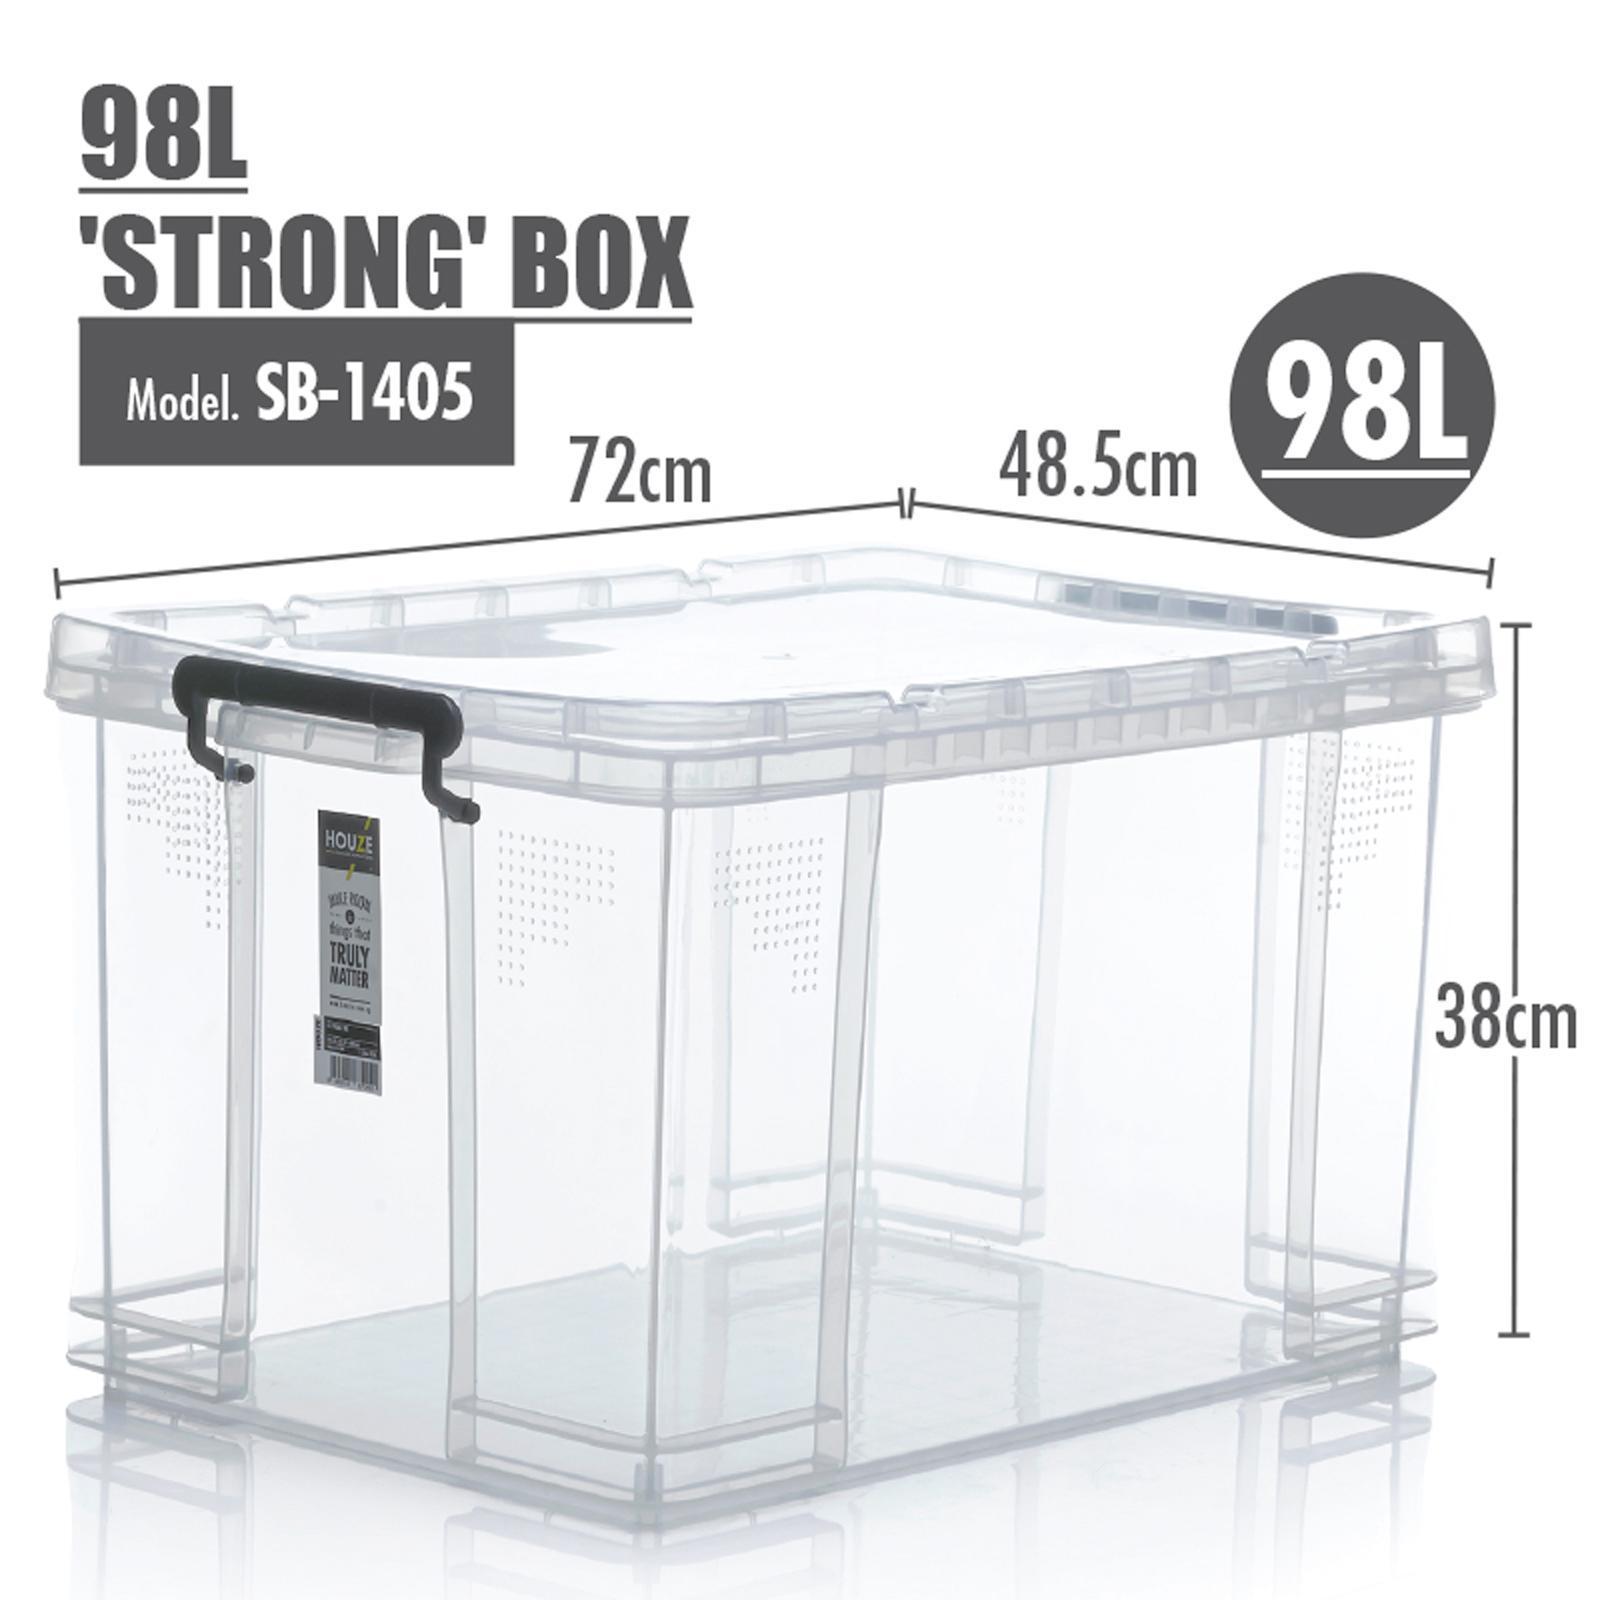 HOUZE 98L 'Strong' Box